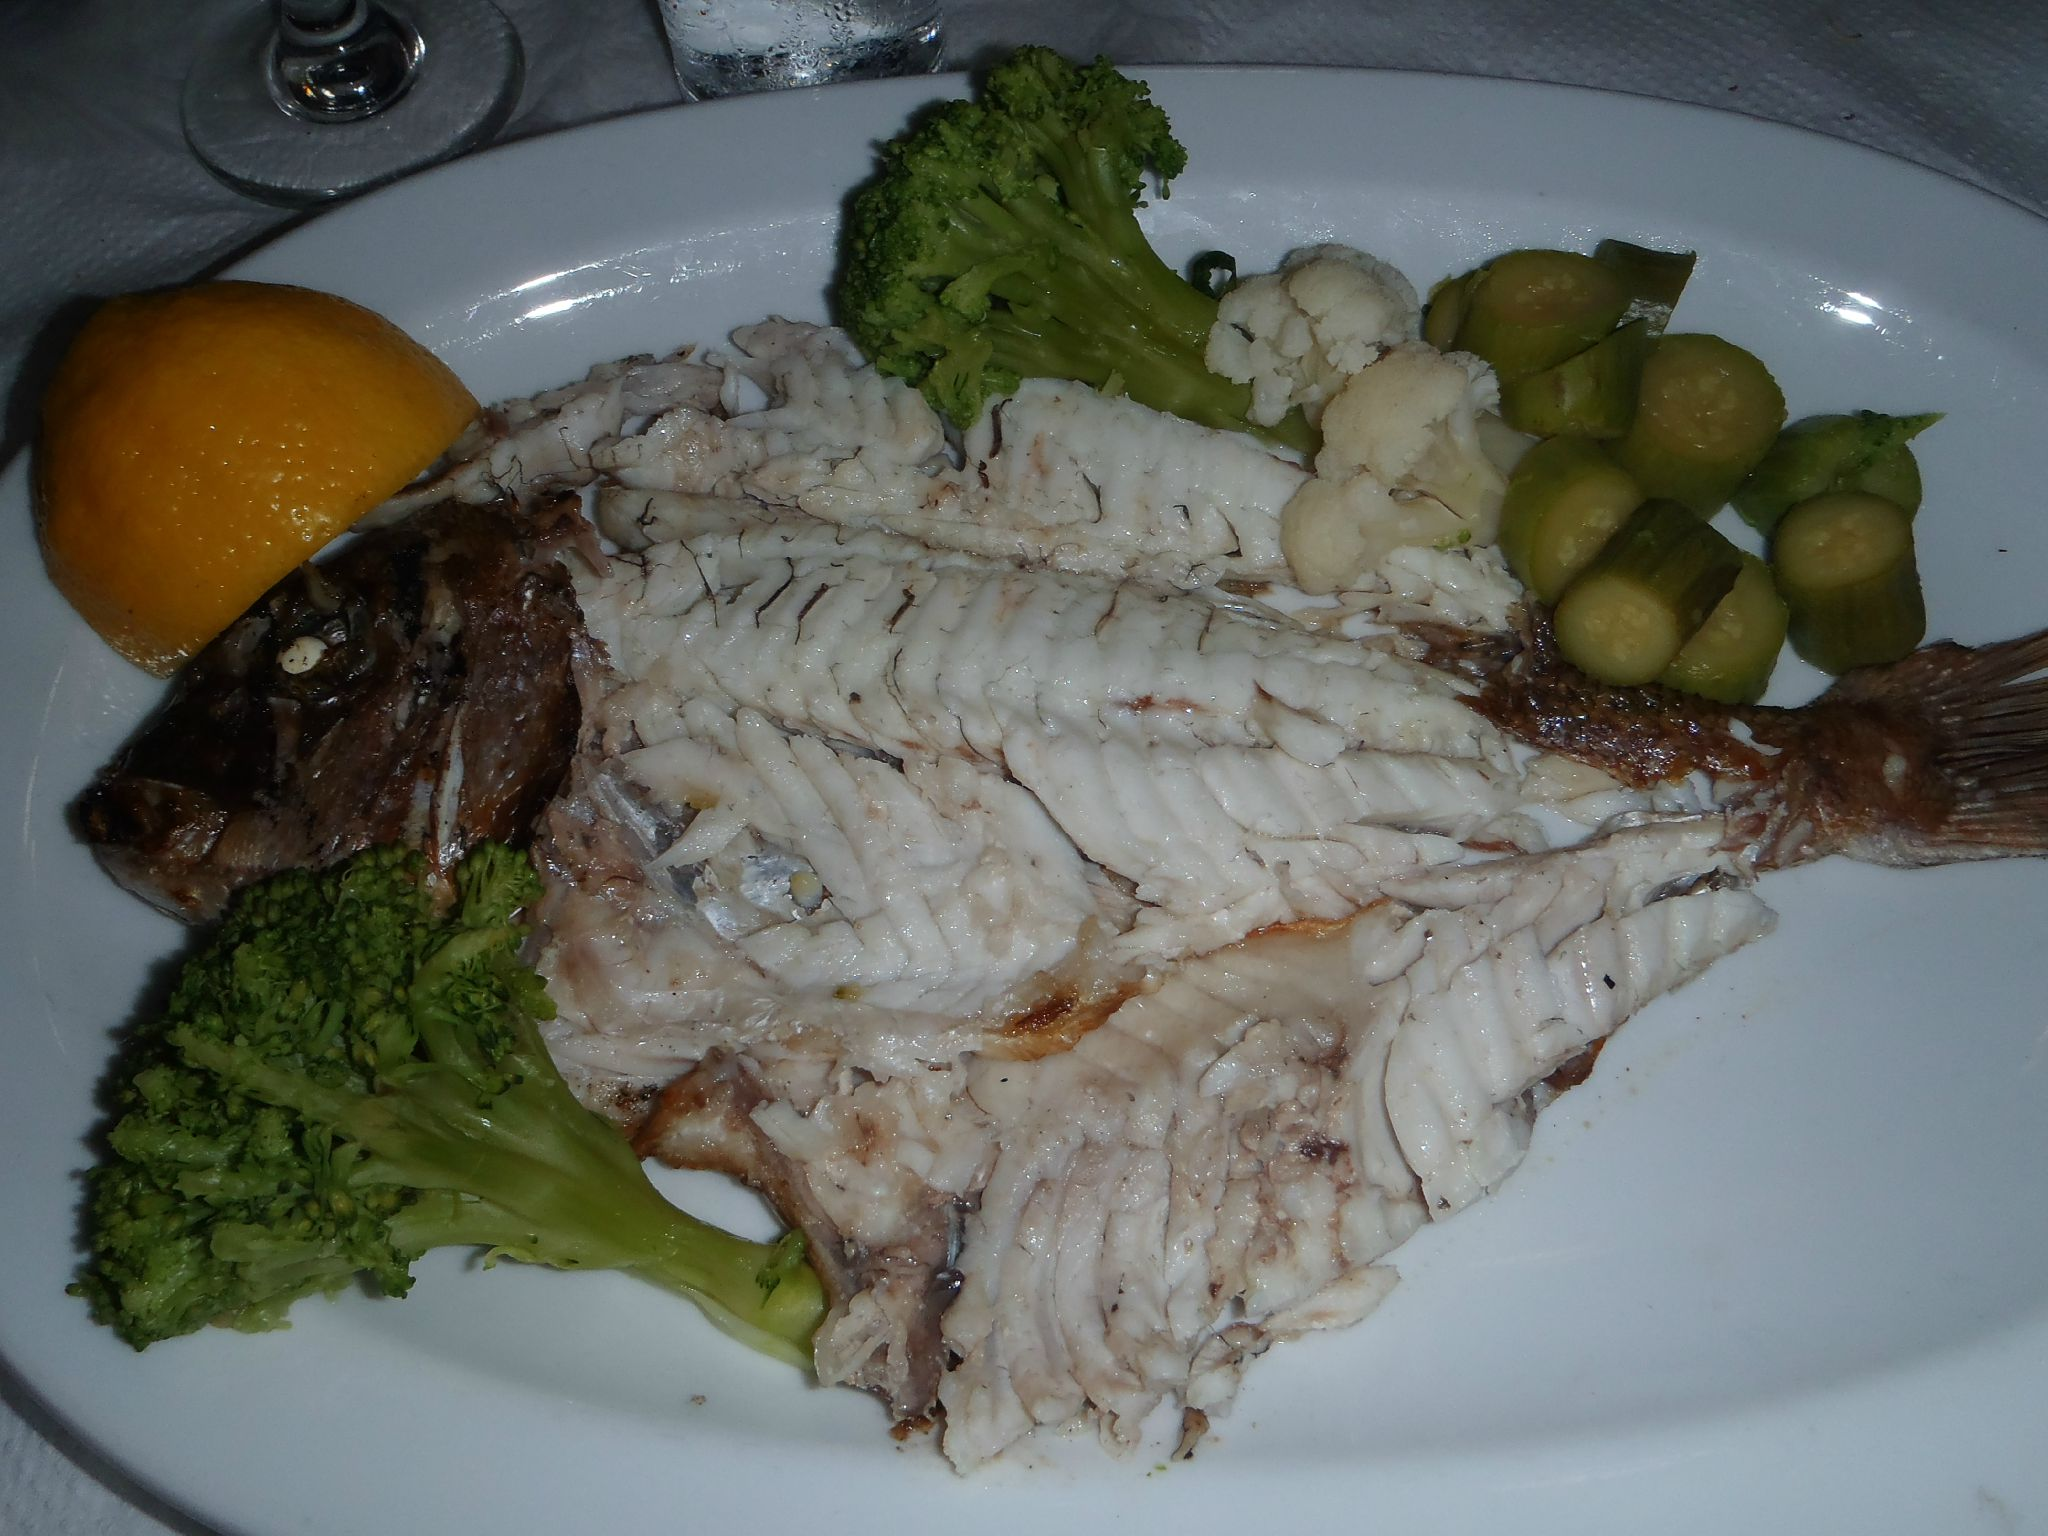 grece nauplie restaurant savoraz dorade grillée préparée